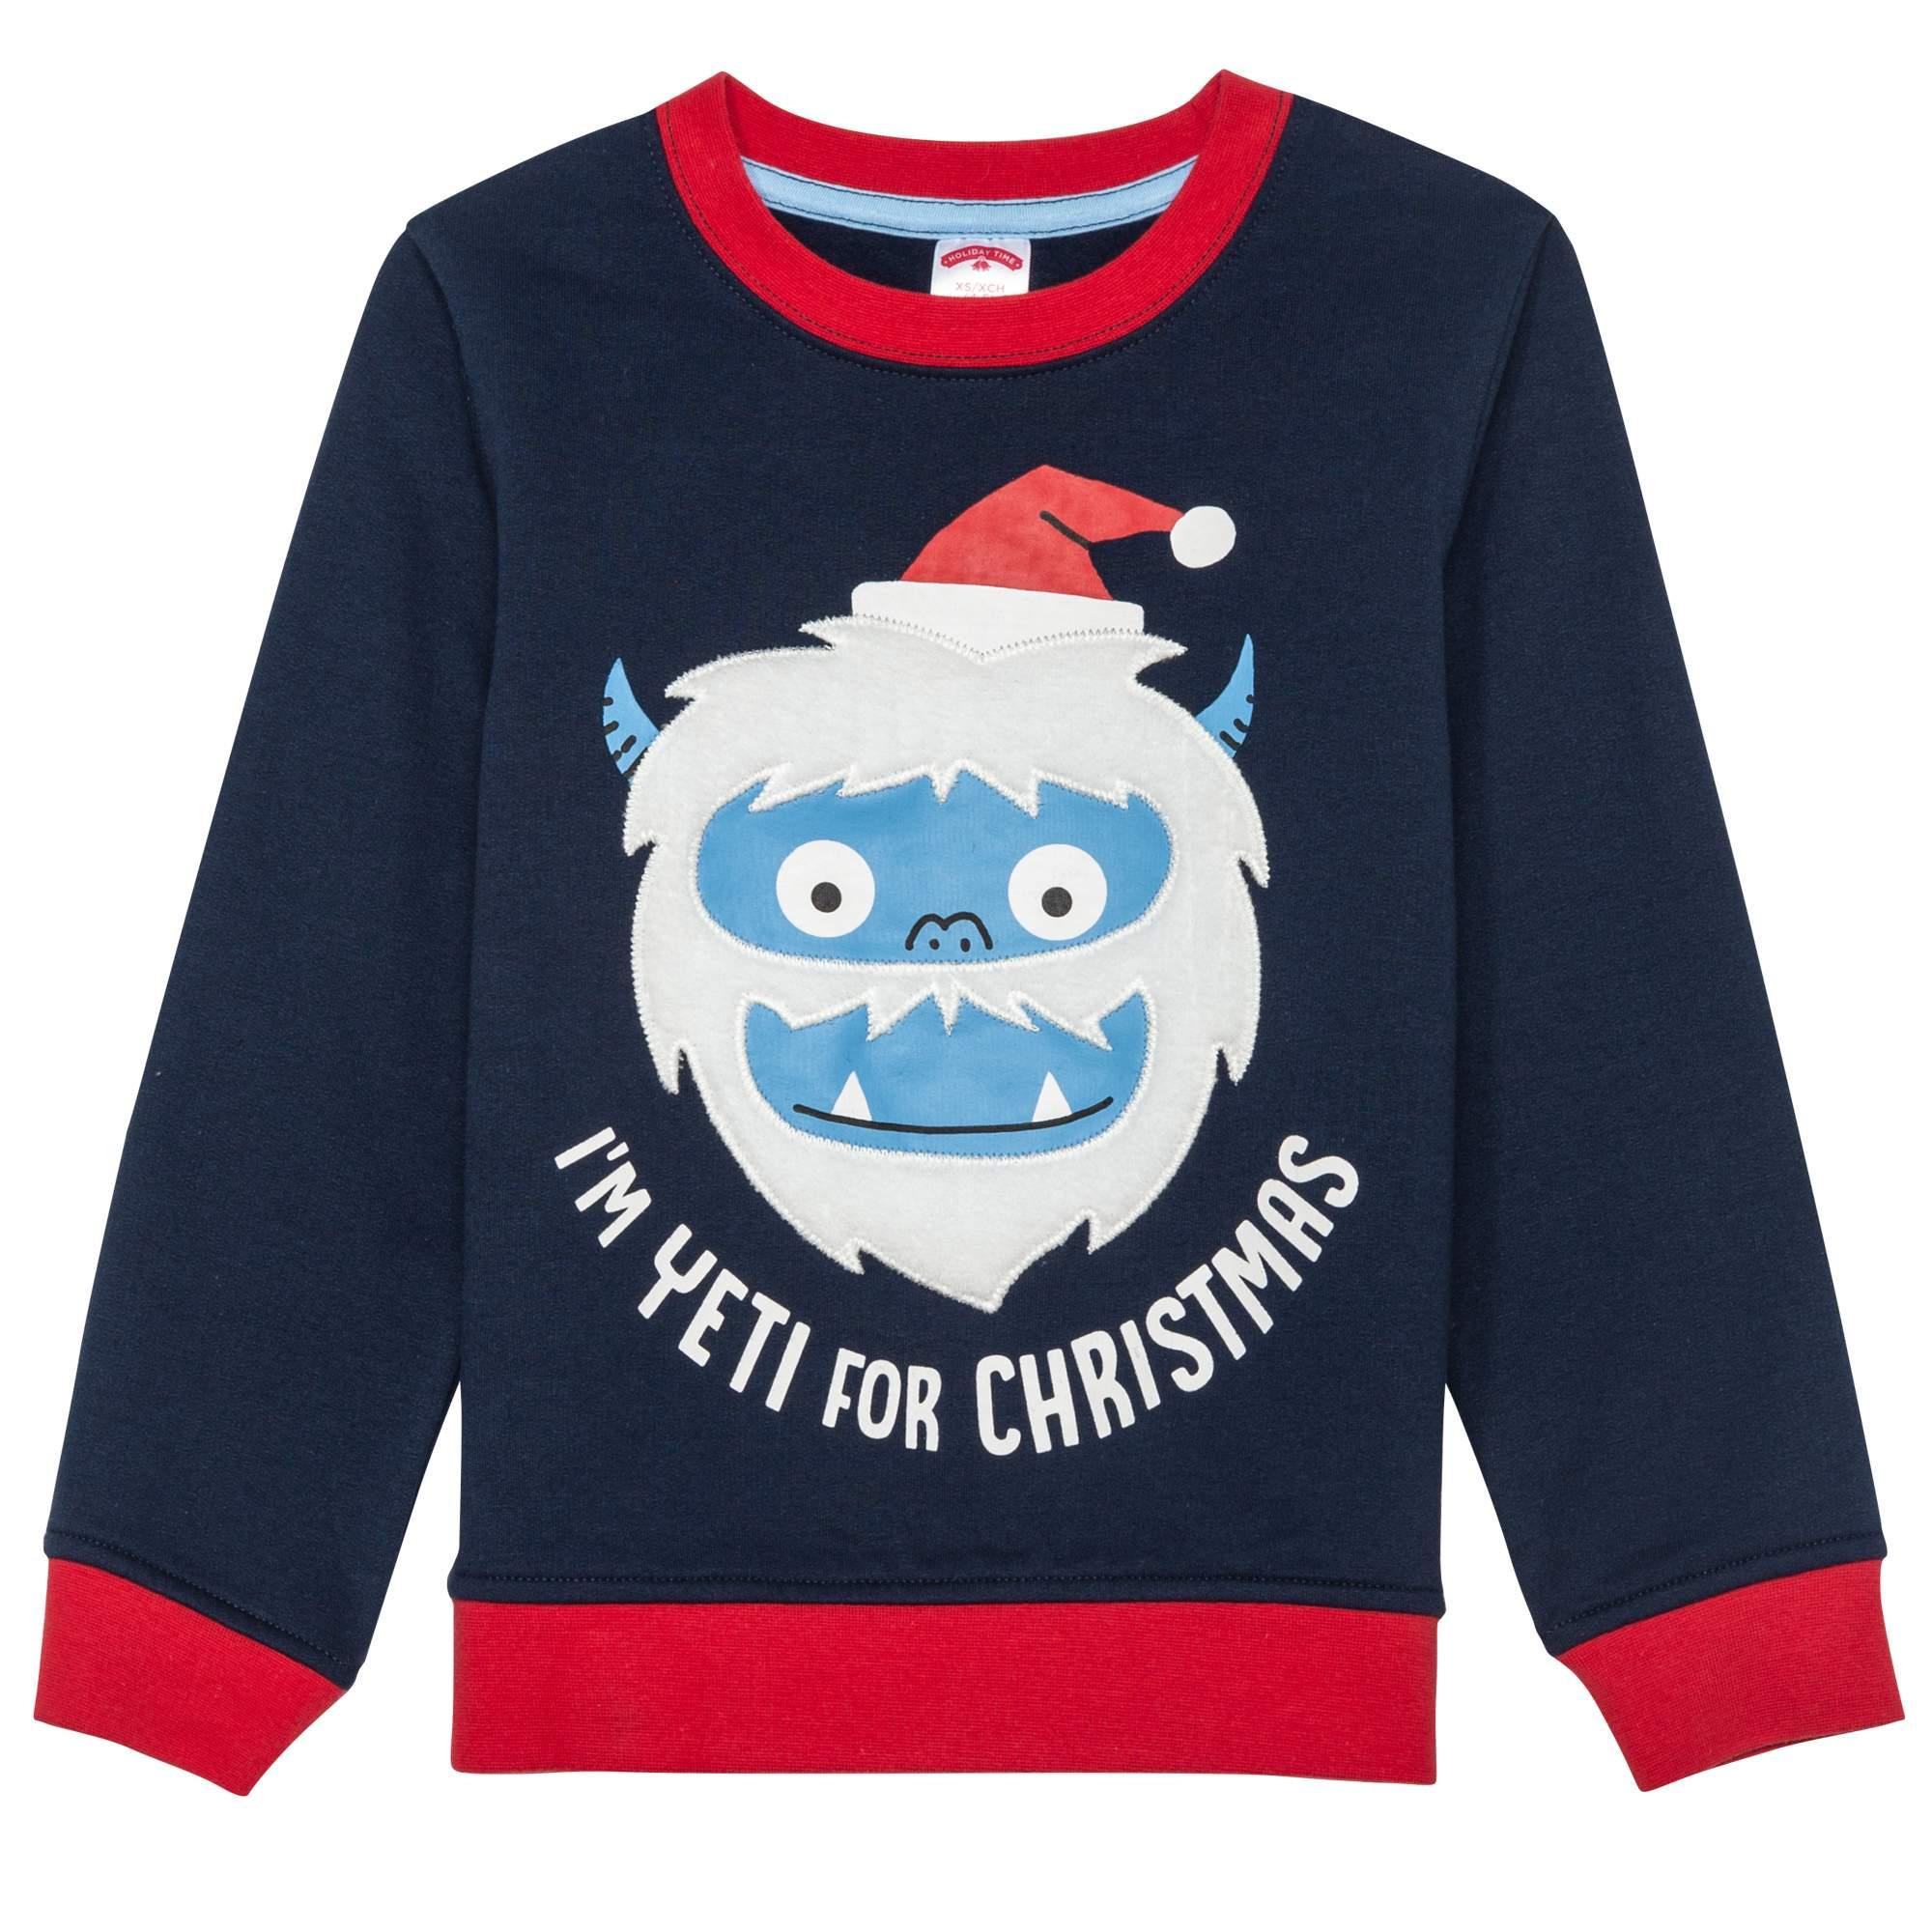 Christmas Christmas Sweater Little Boys Big Boys Walmartcom